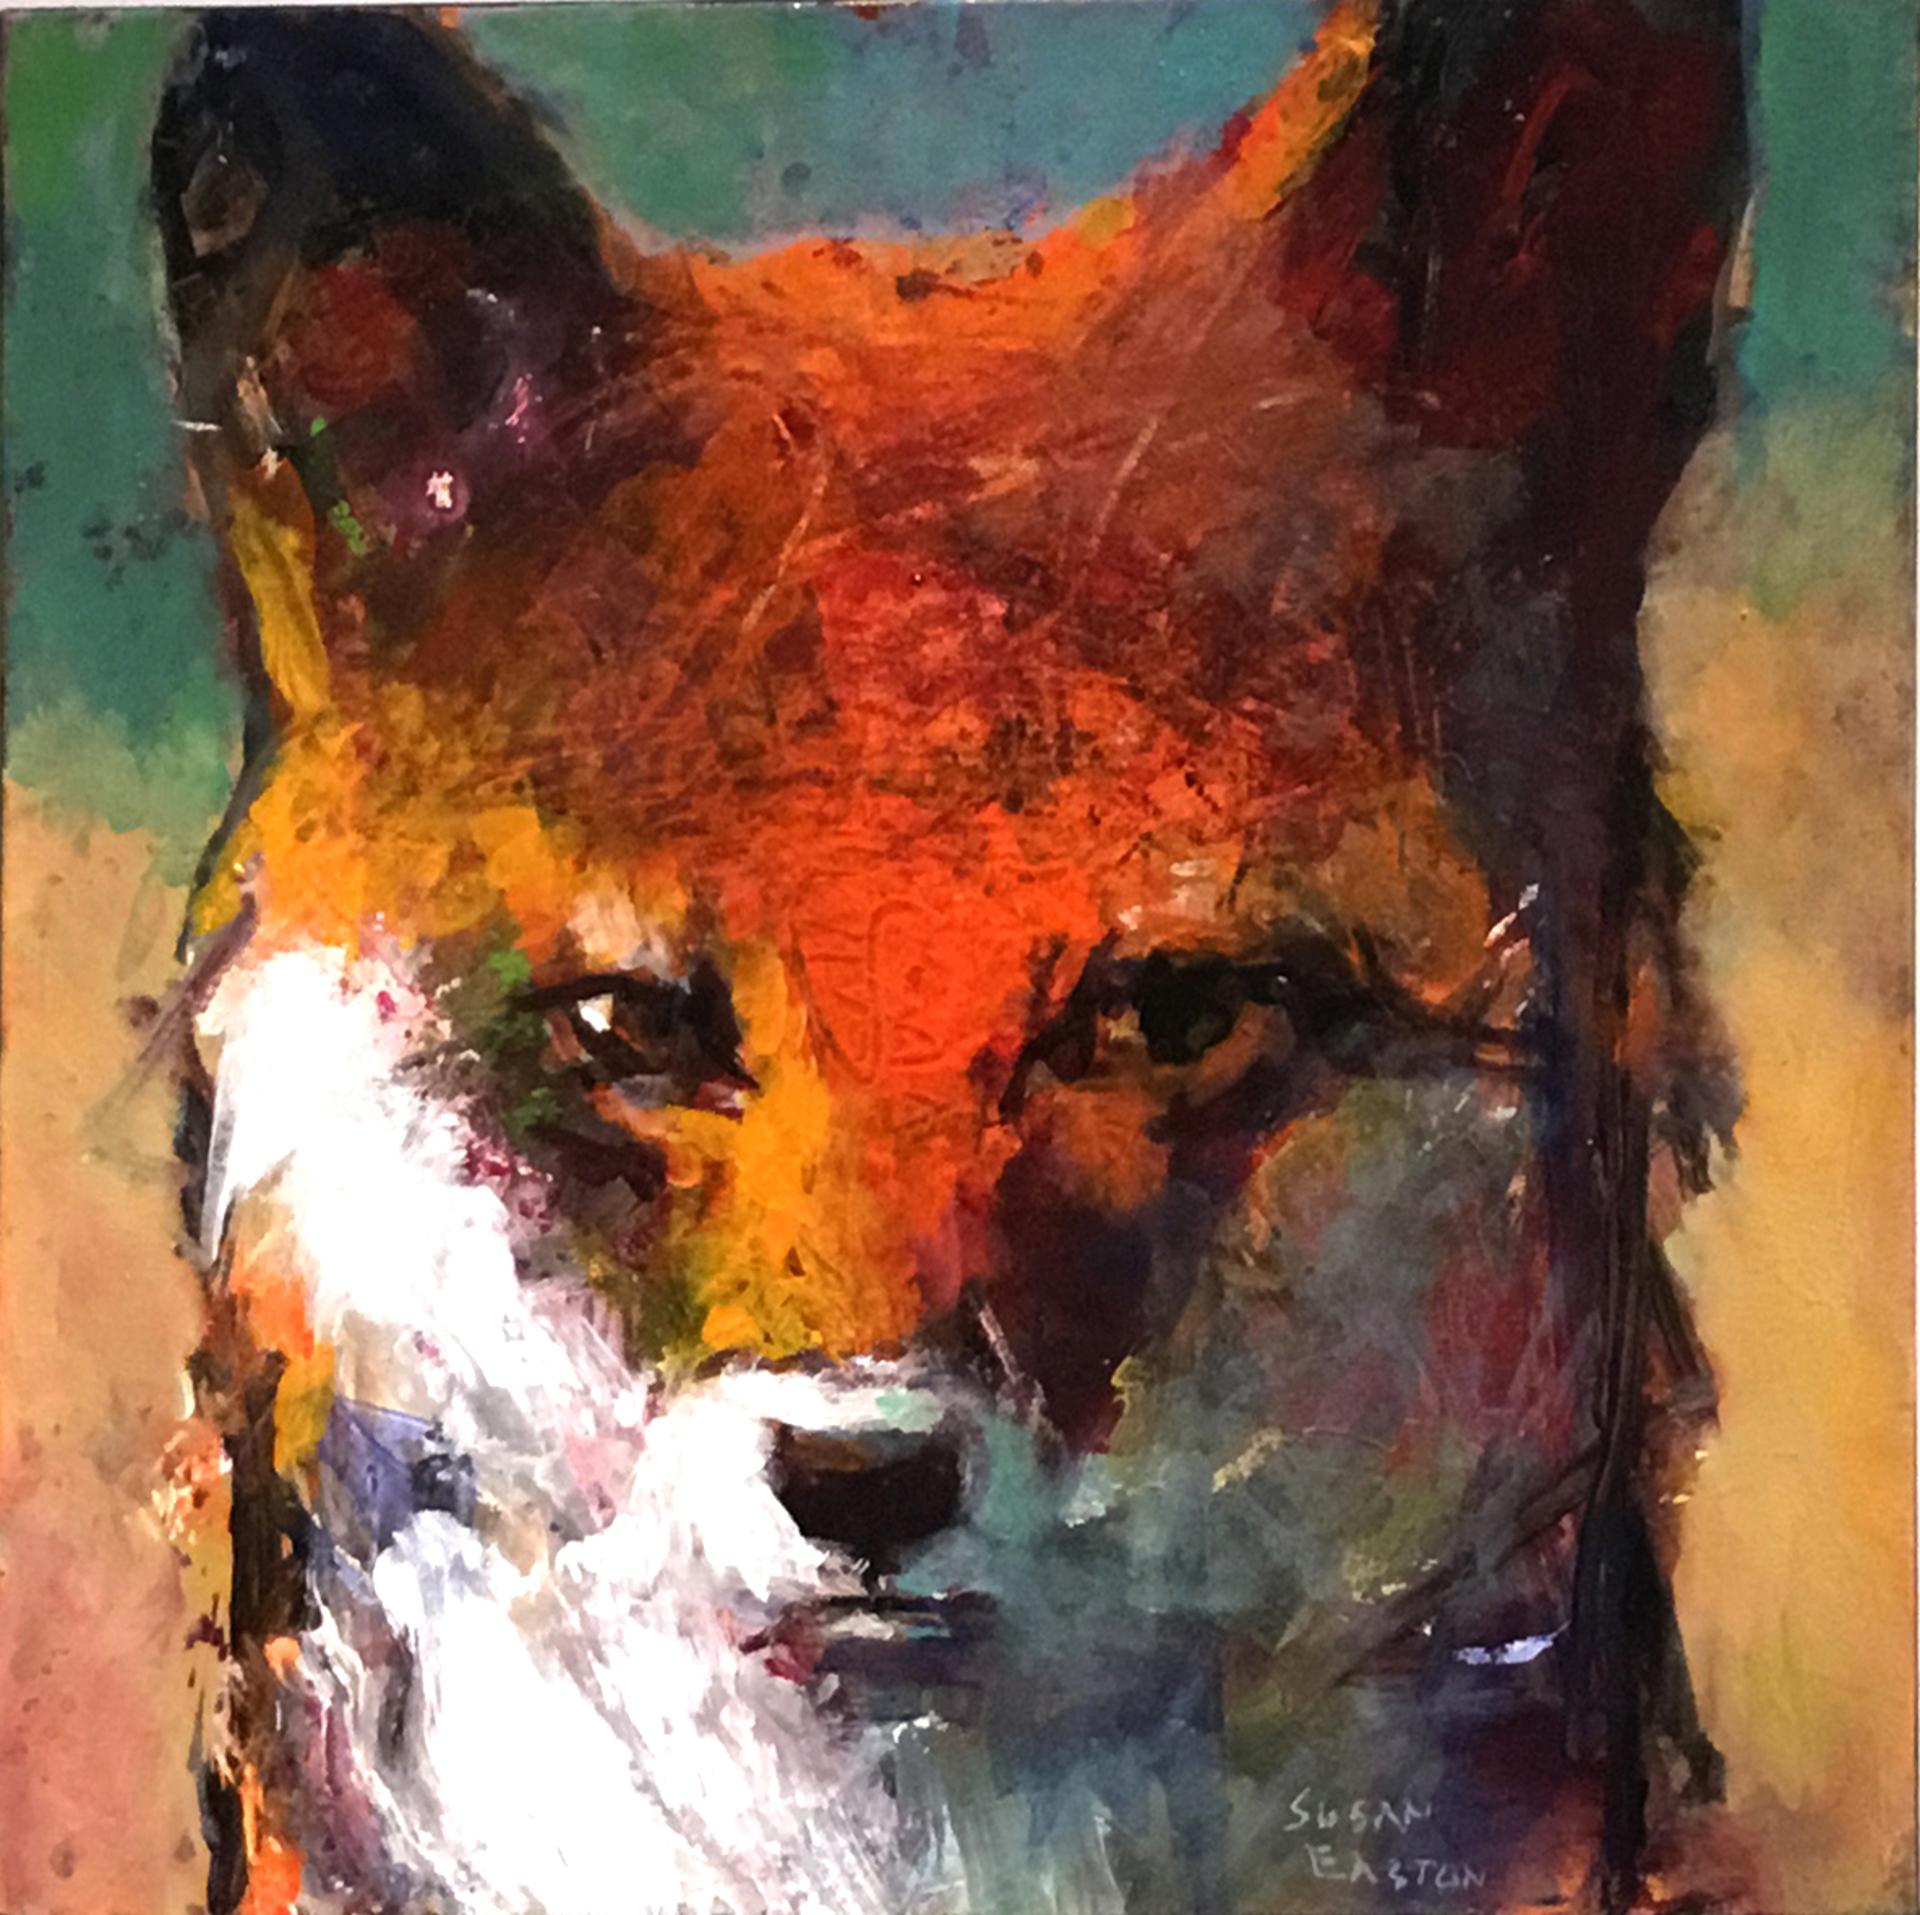 No Self Pity by Susan Easton Burns